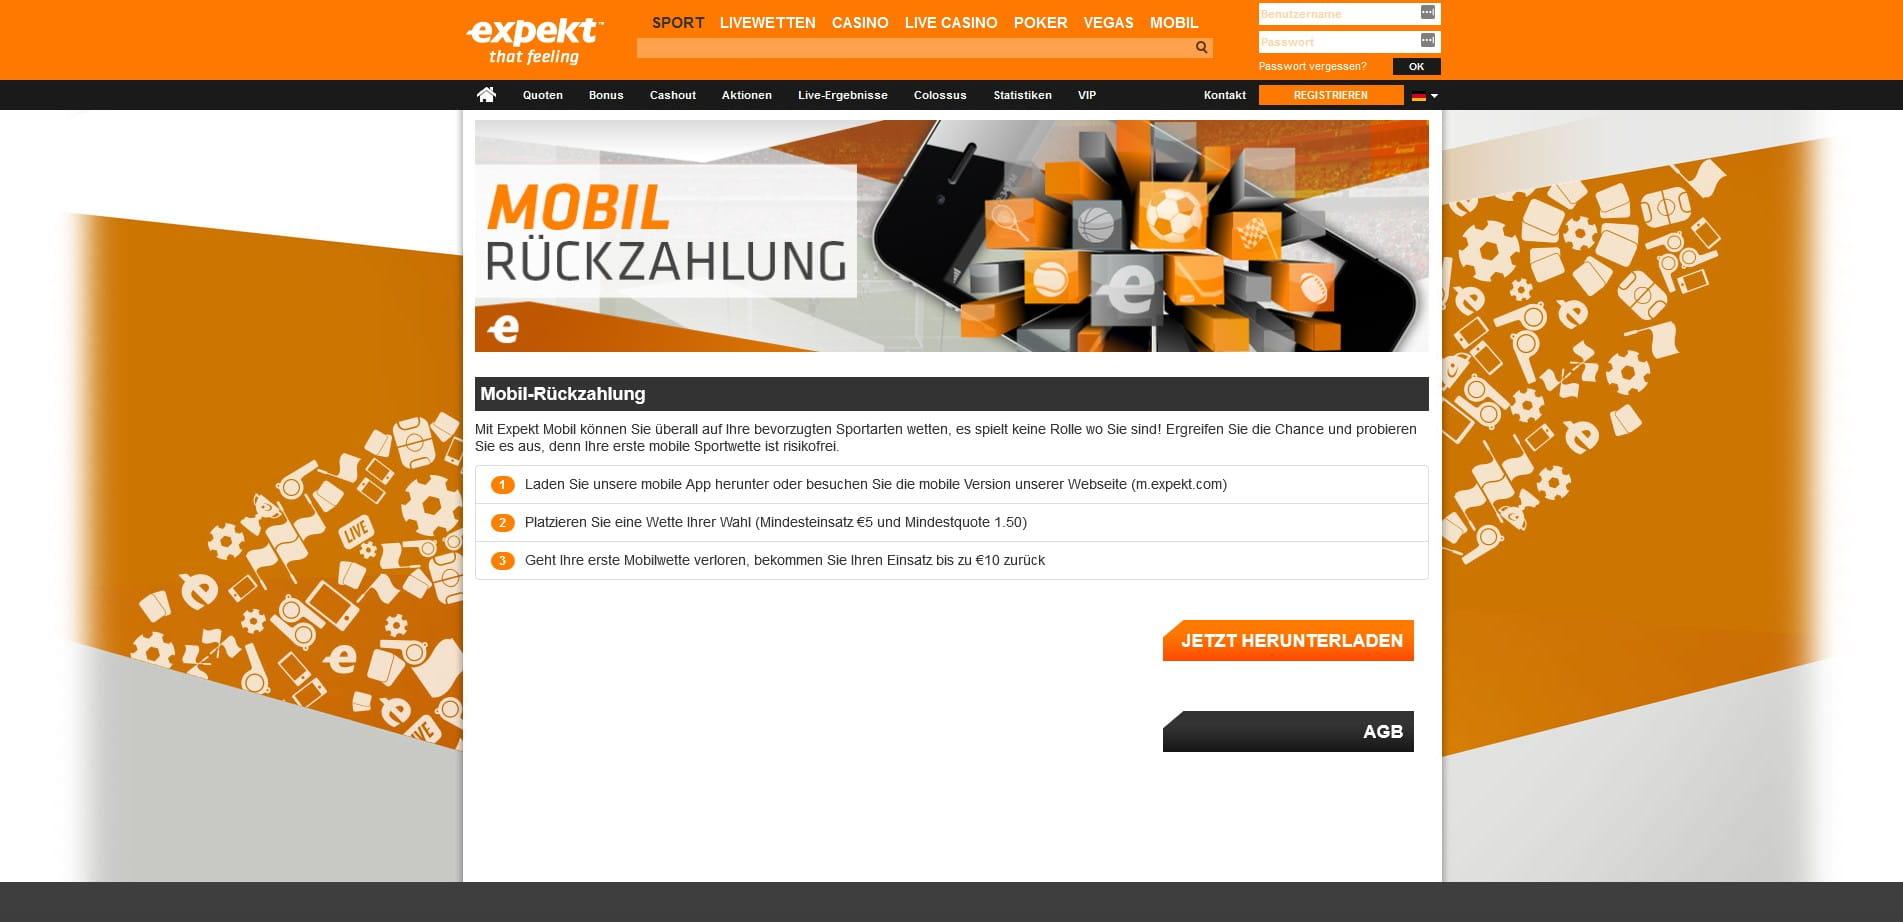 mobile wetten bonus